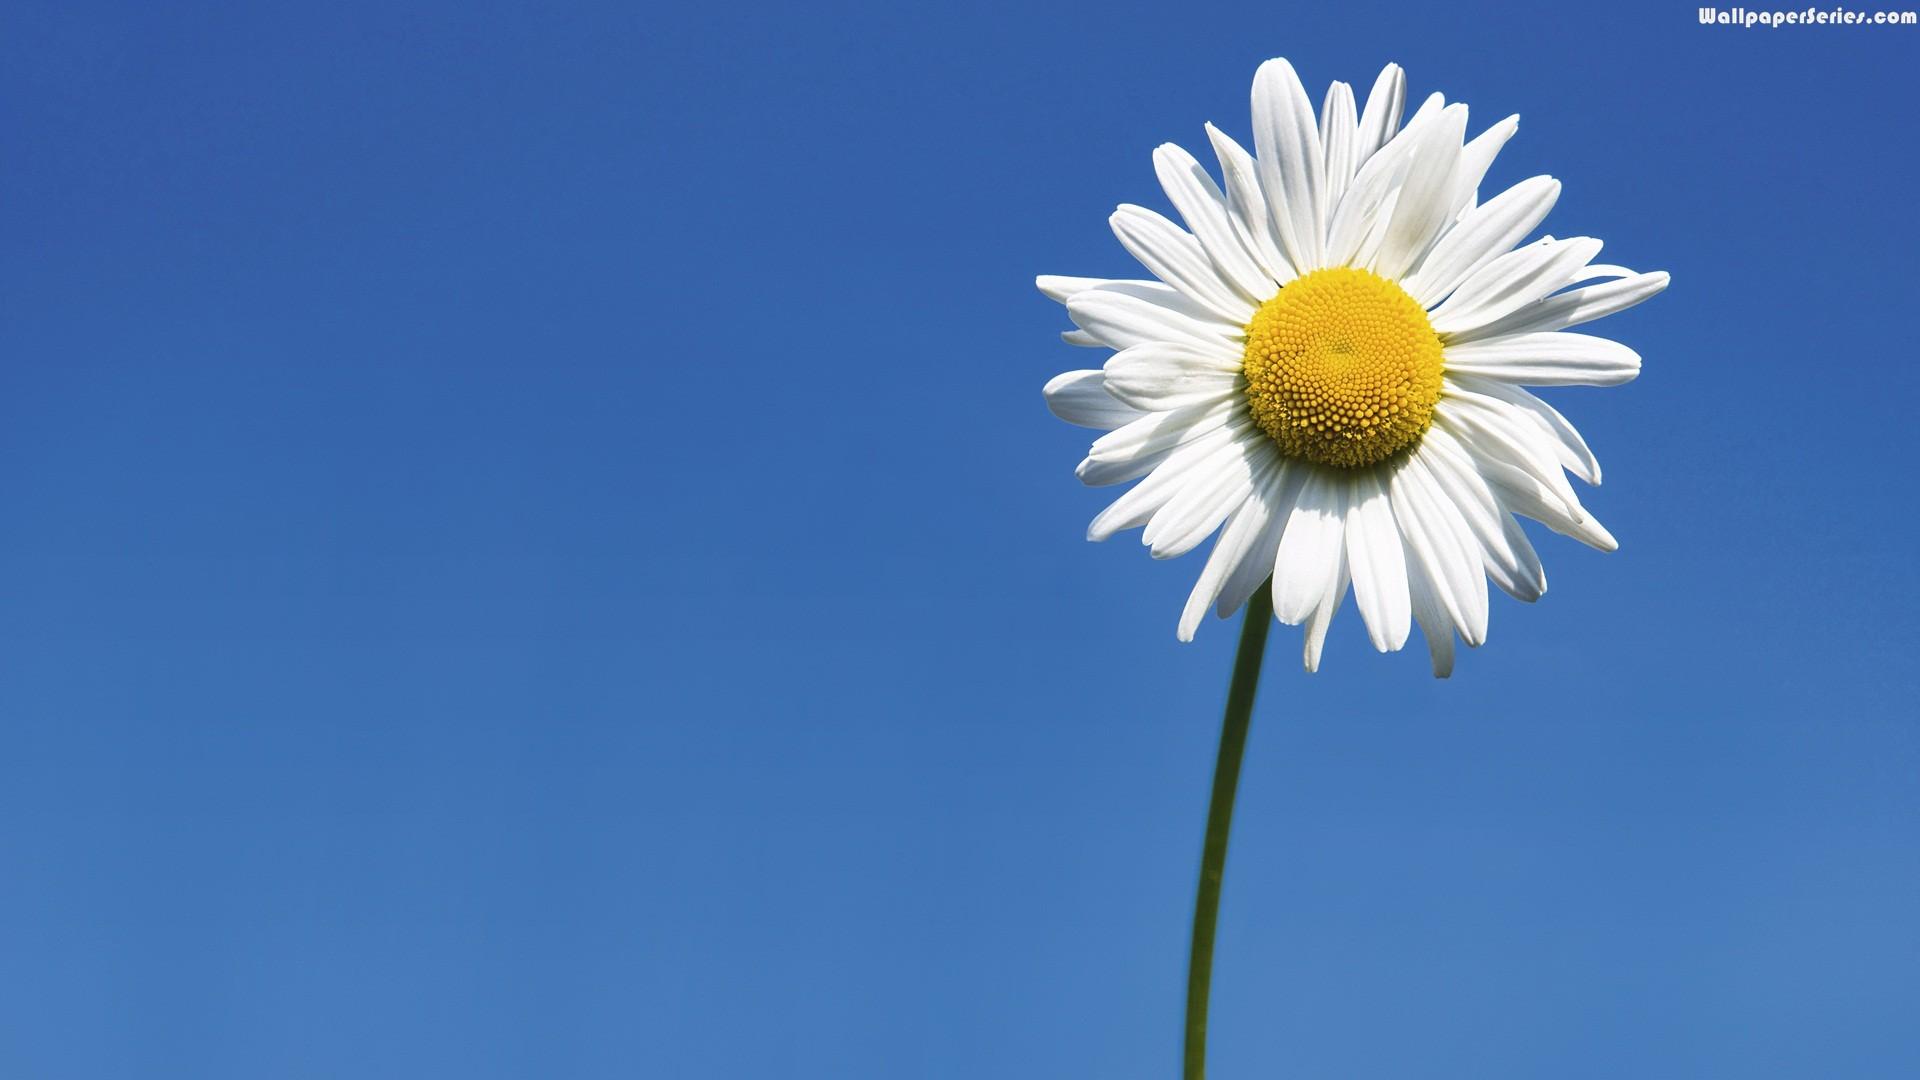 1920x1080, Daisy, Flowers, Wallpaper